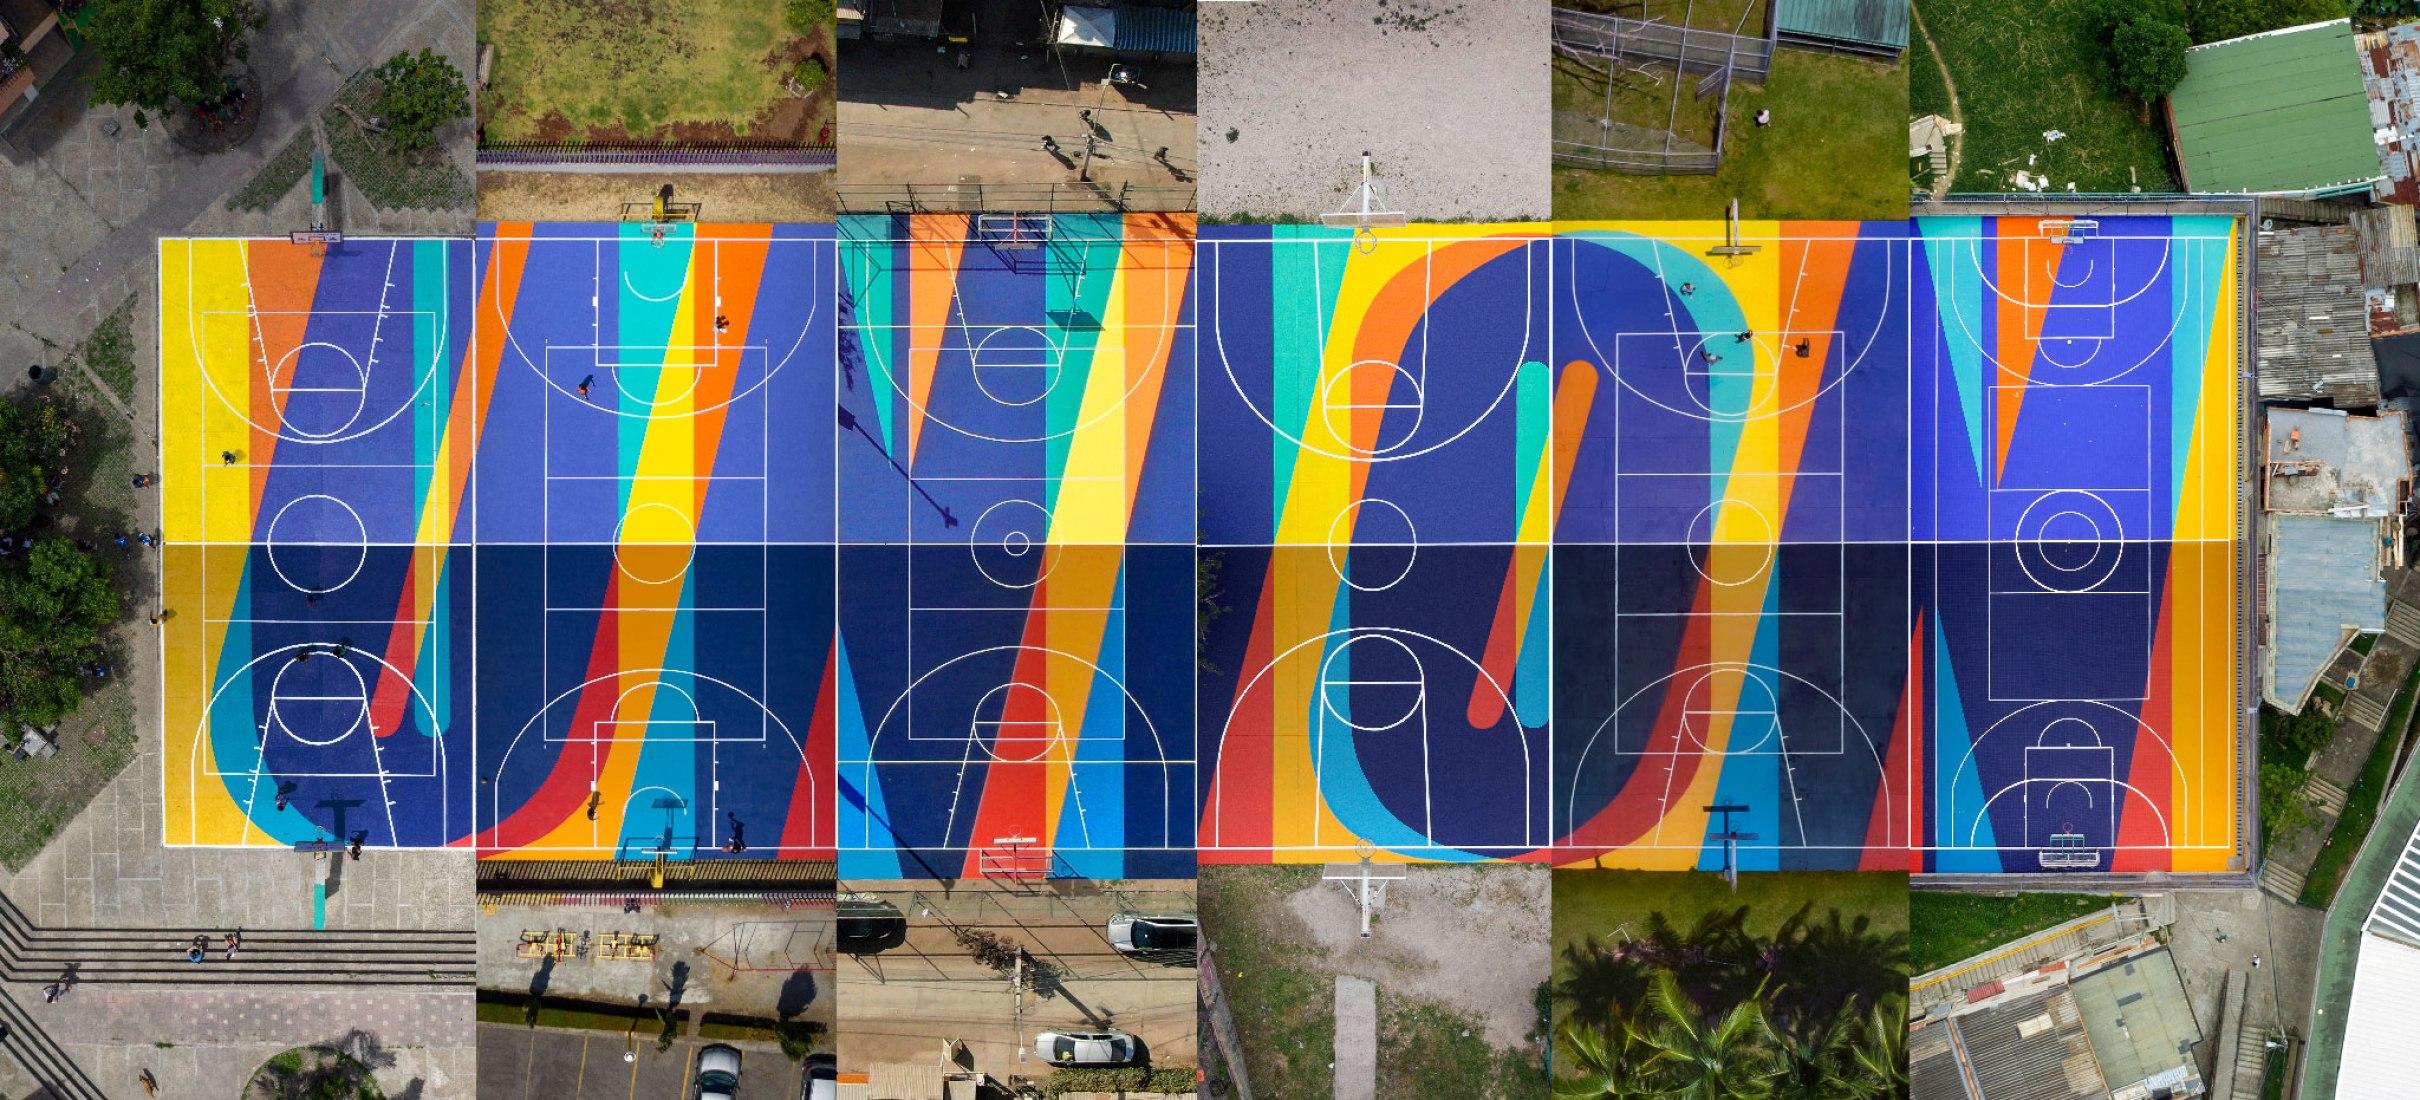 Collage. UNIÓN by Boa Mistura, Myke Towers.